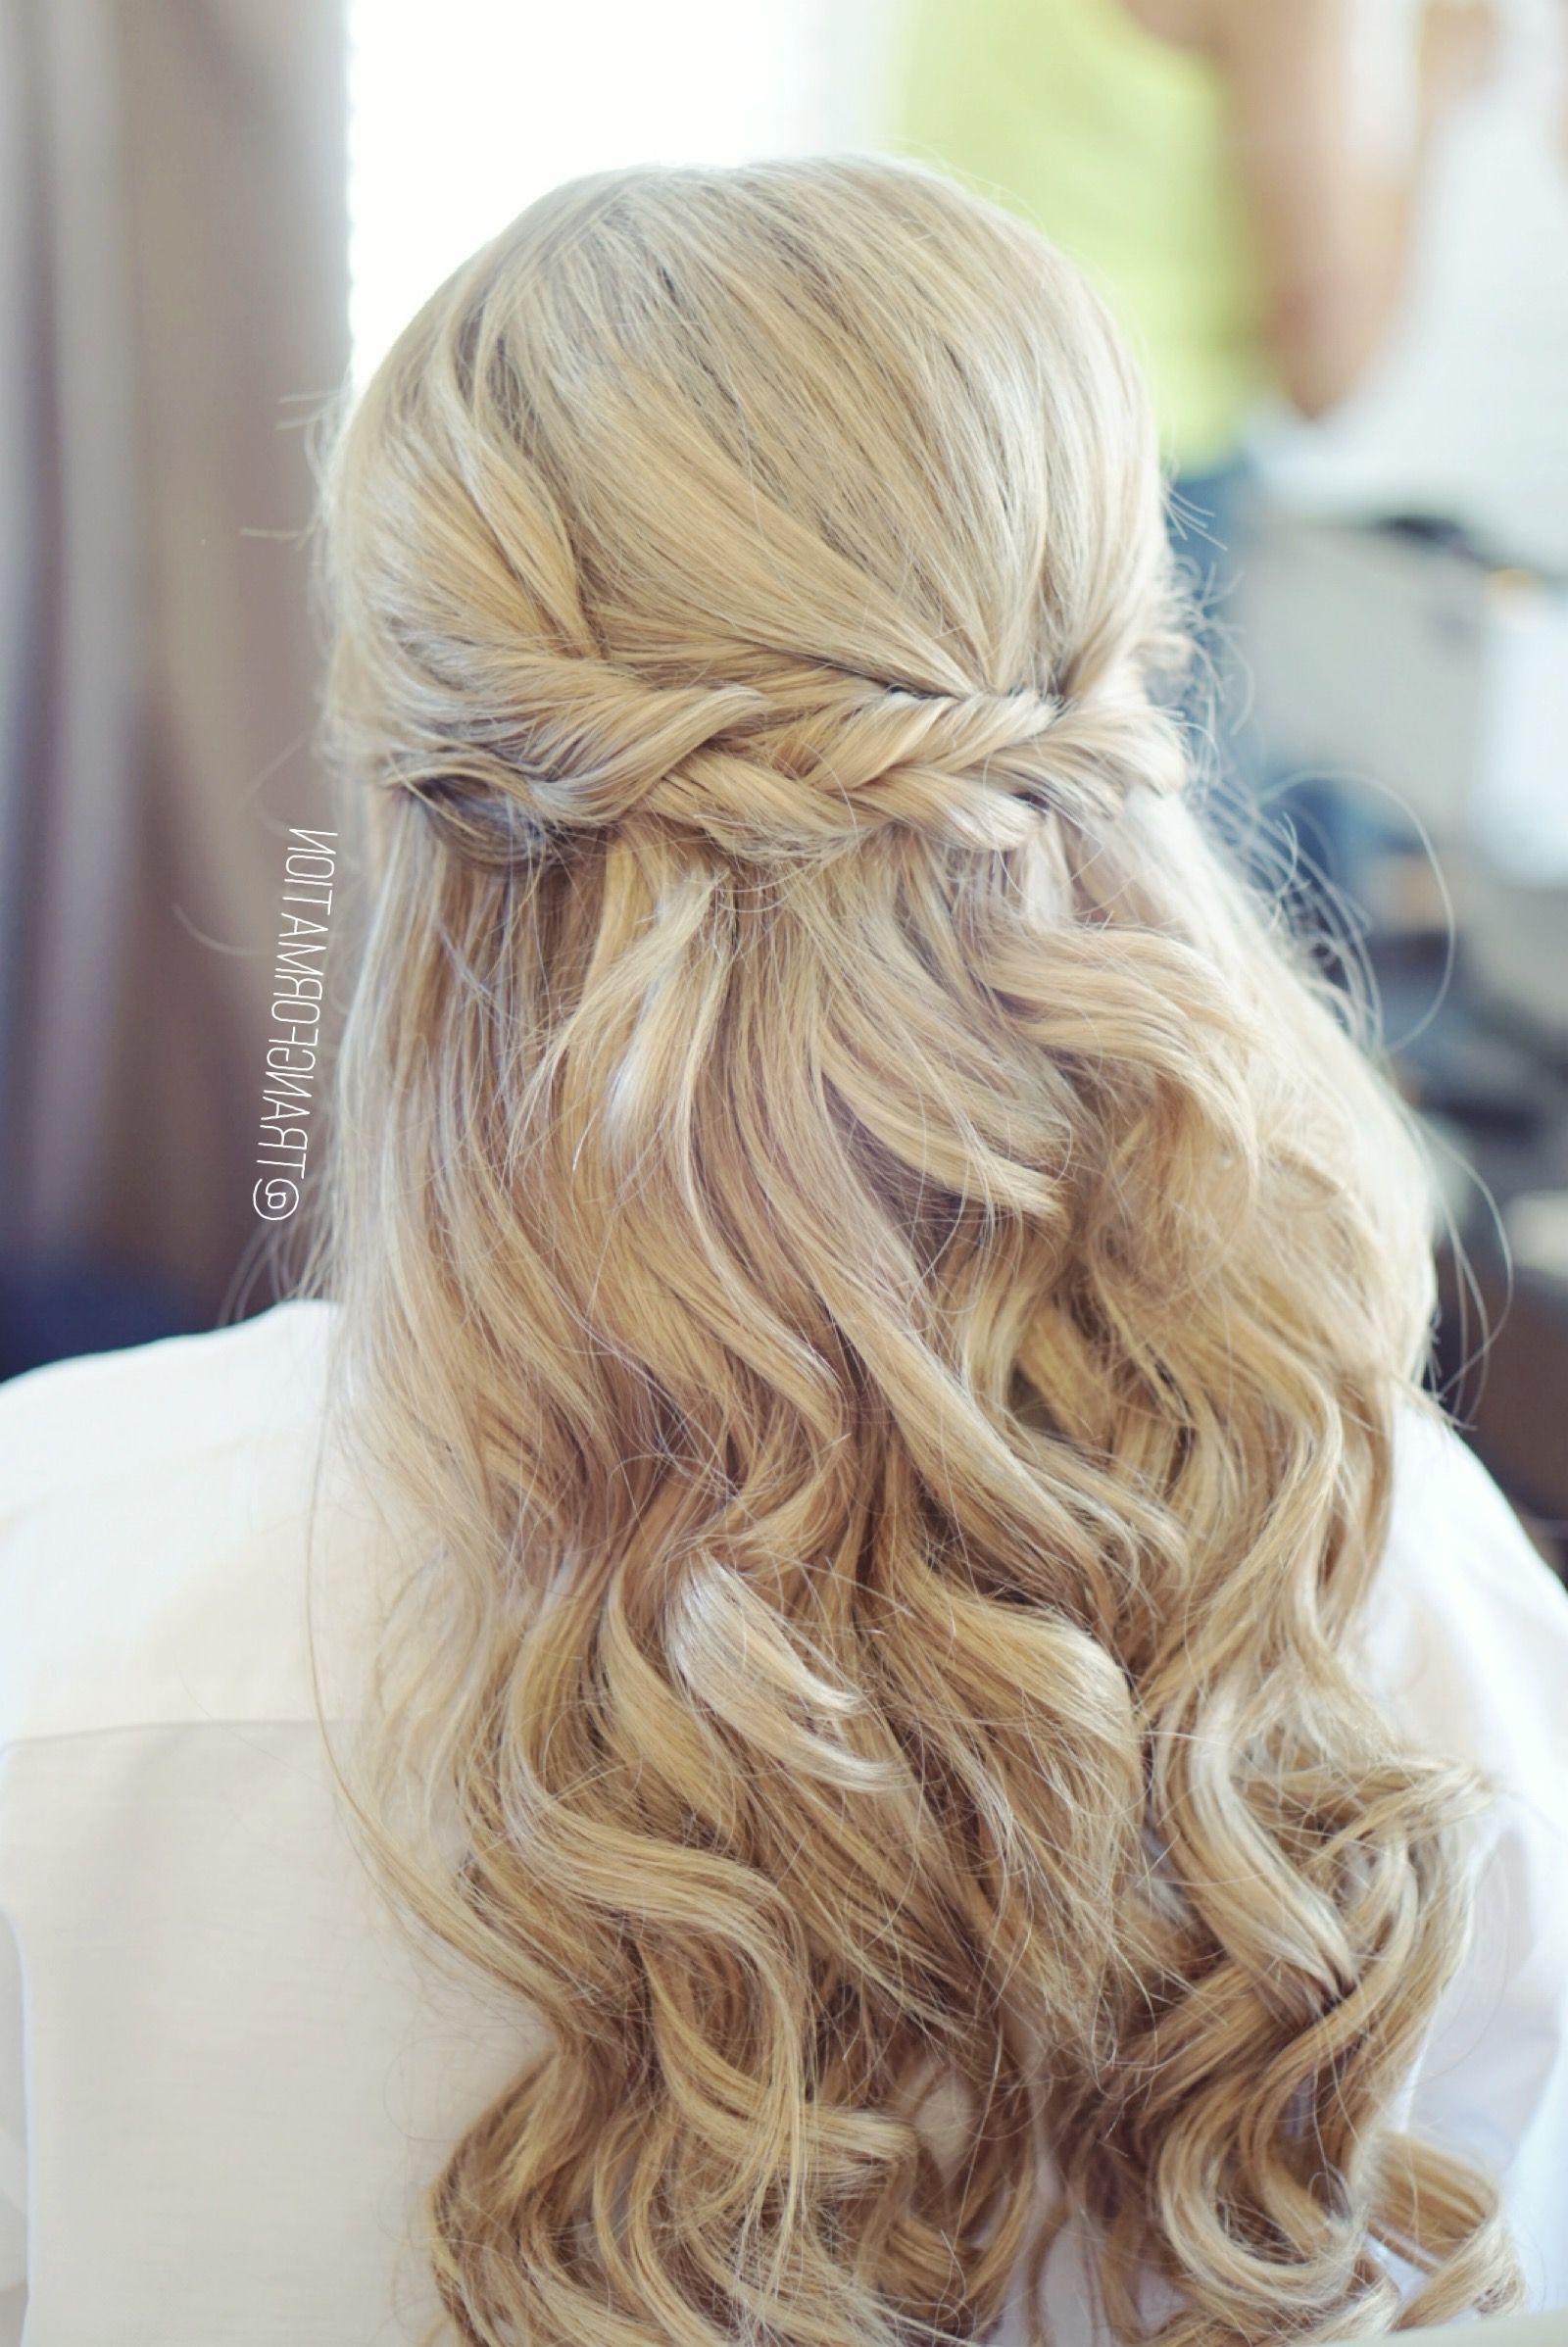 Half Up Half Down, Bridal Hair, Wedding Hair, Bride, Wedding Inside Trendy Hair Up Wedding Hairstyles (View 3 of 15)